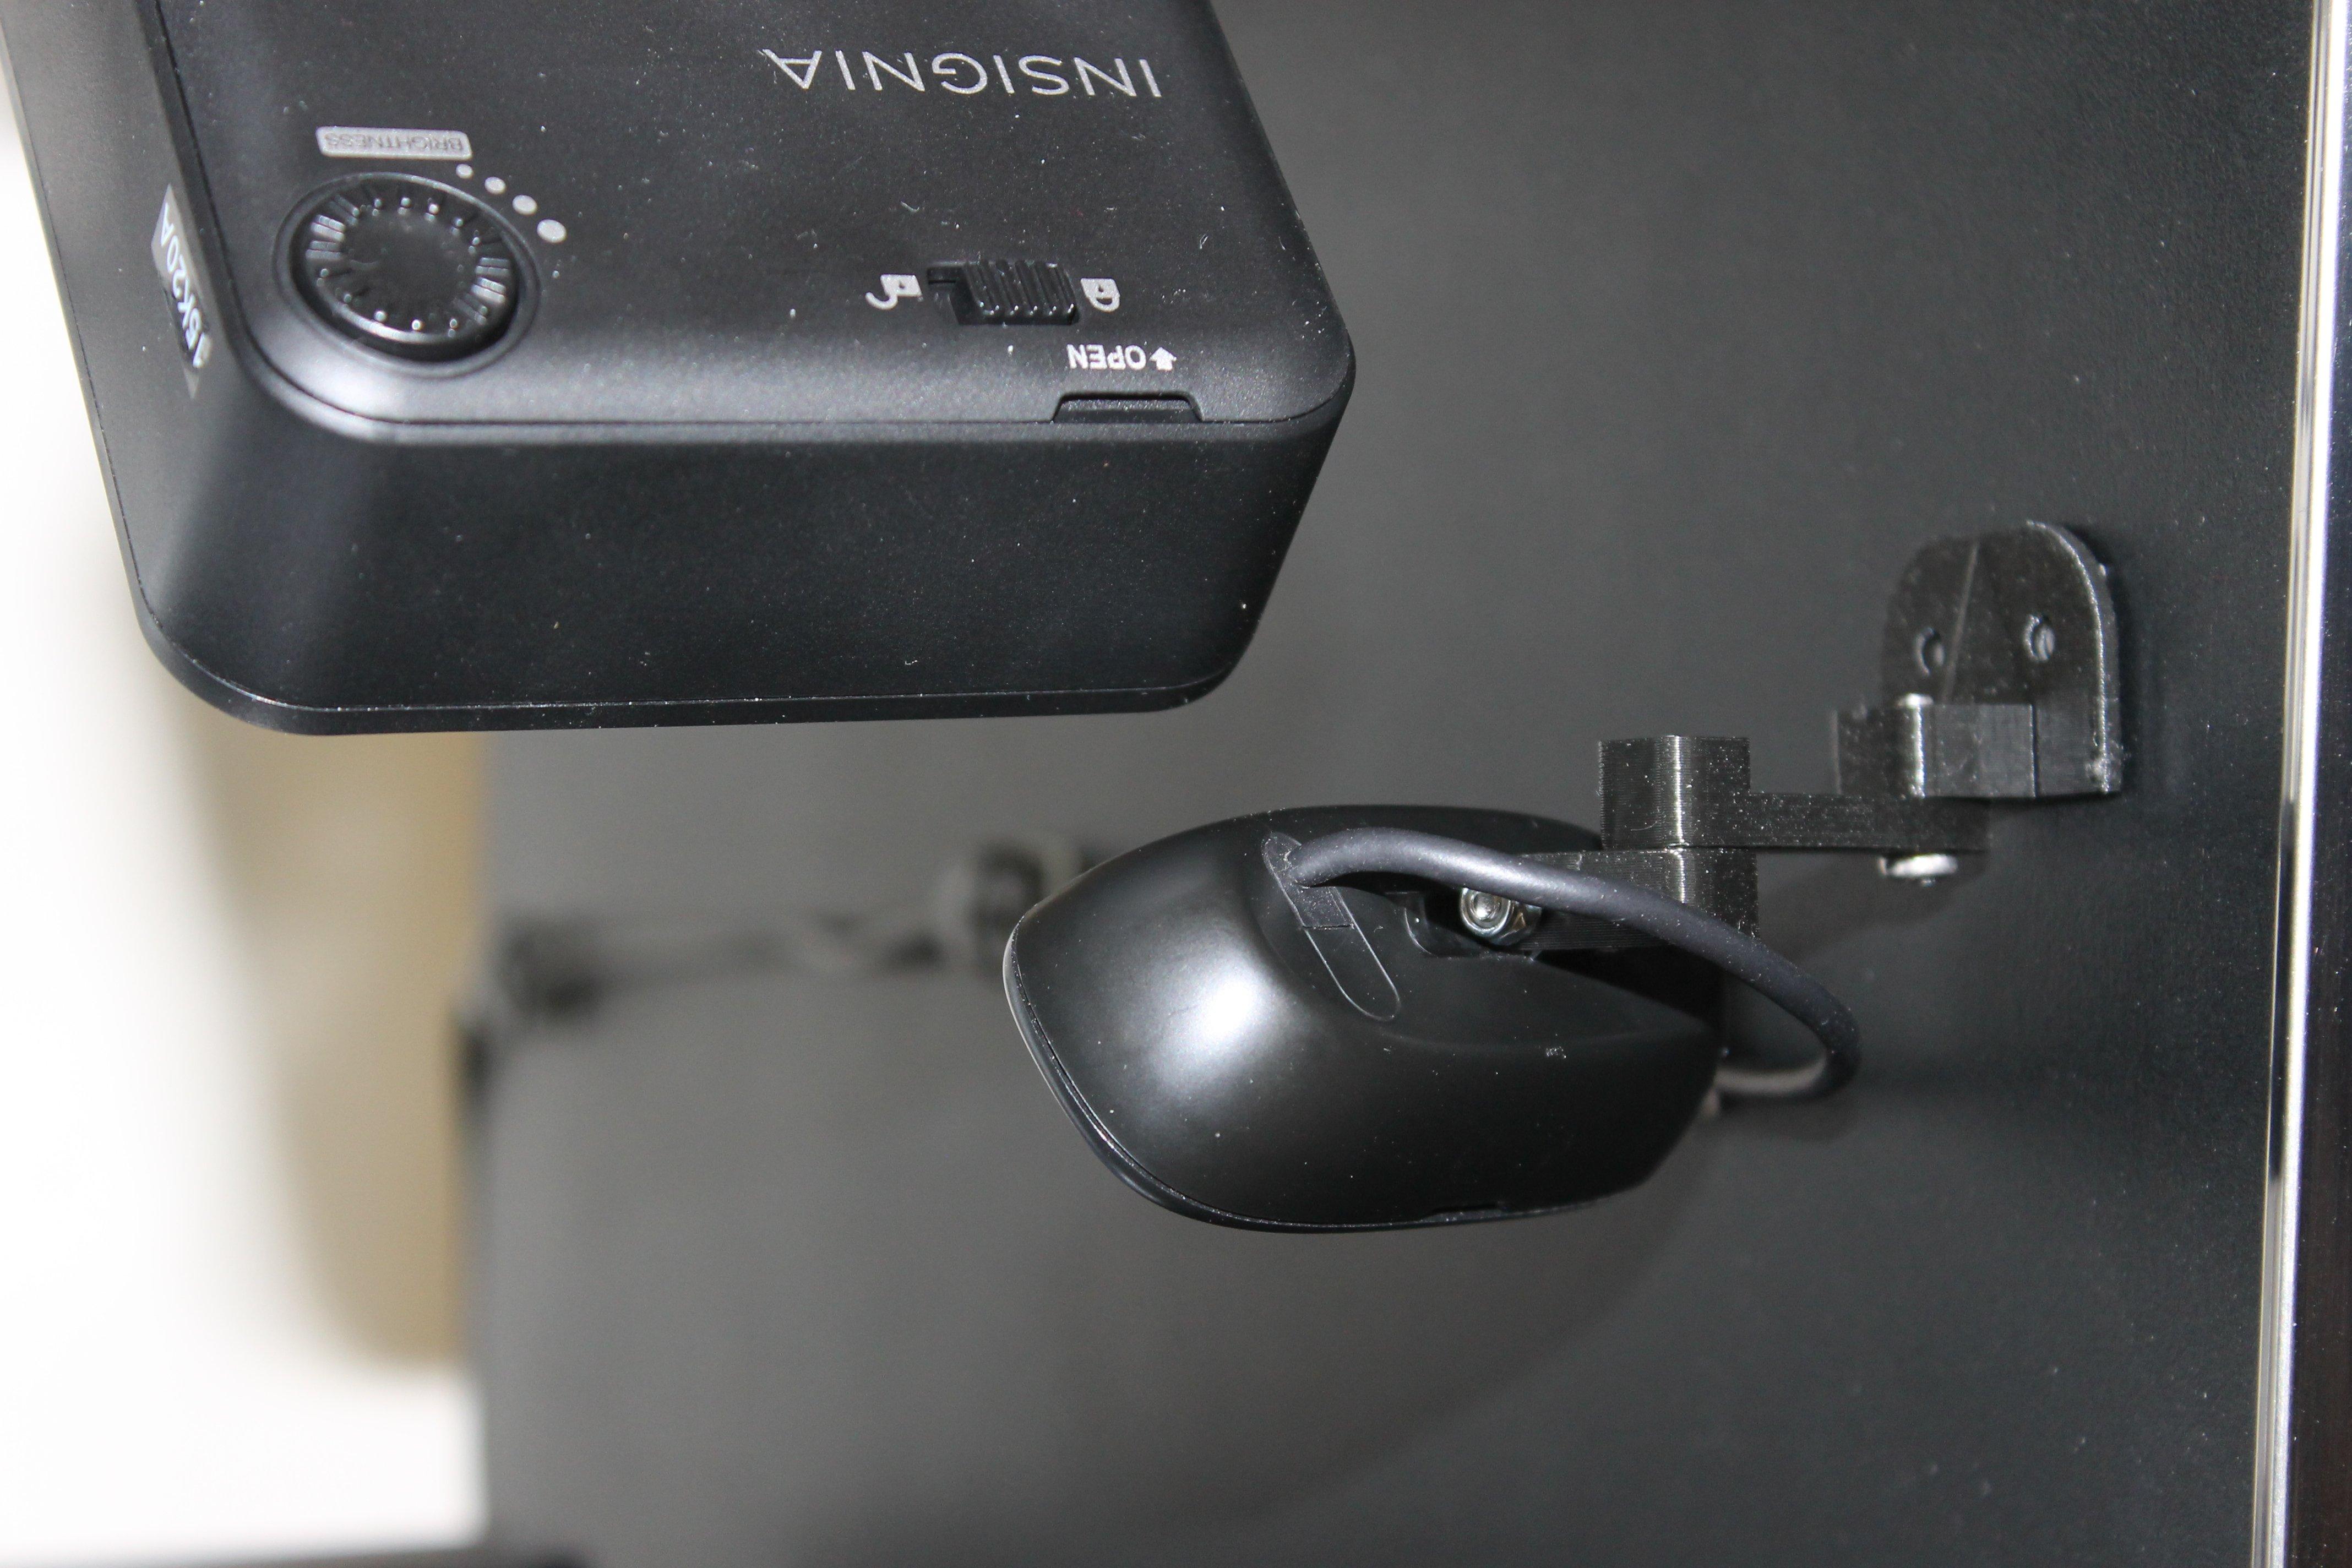 Logitech C270 310 Universal Webcam Mount Scews Or 3m Vhb By Kjedelberg Original